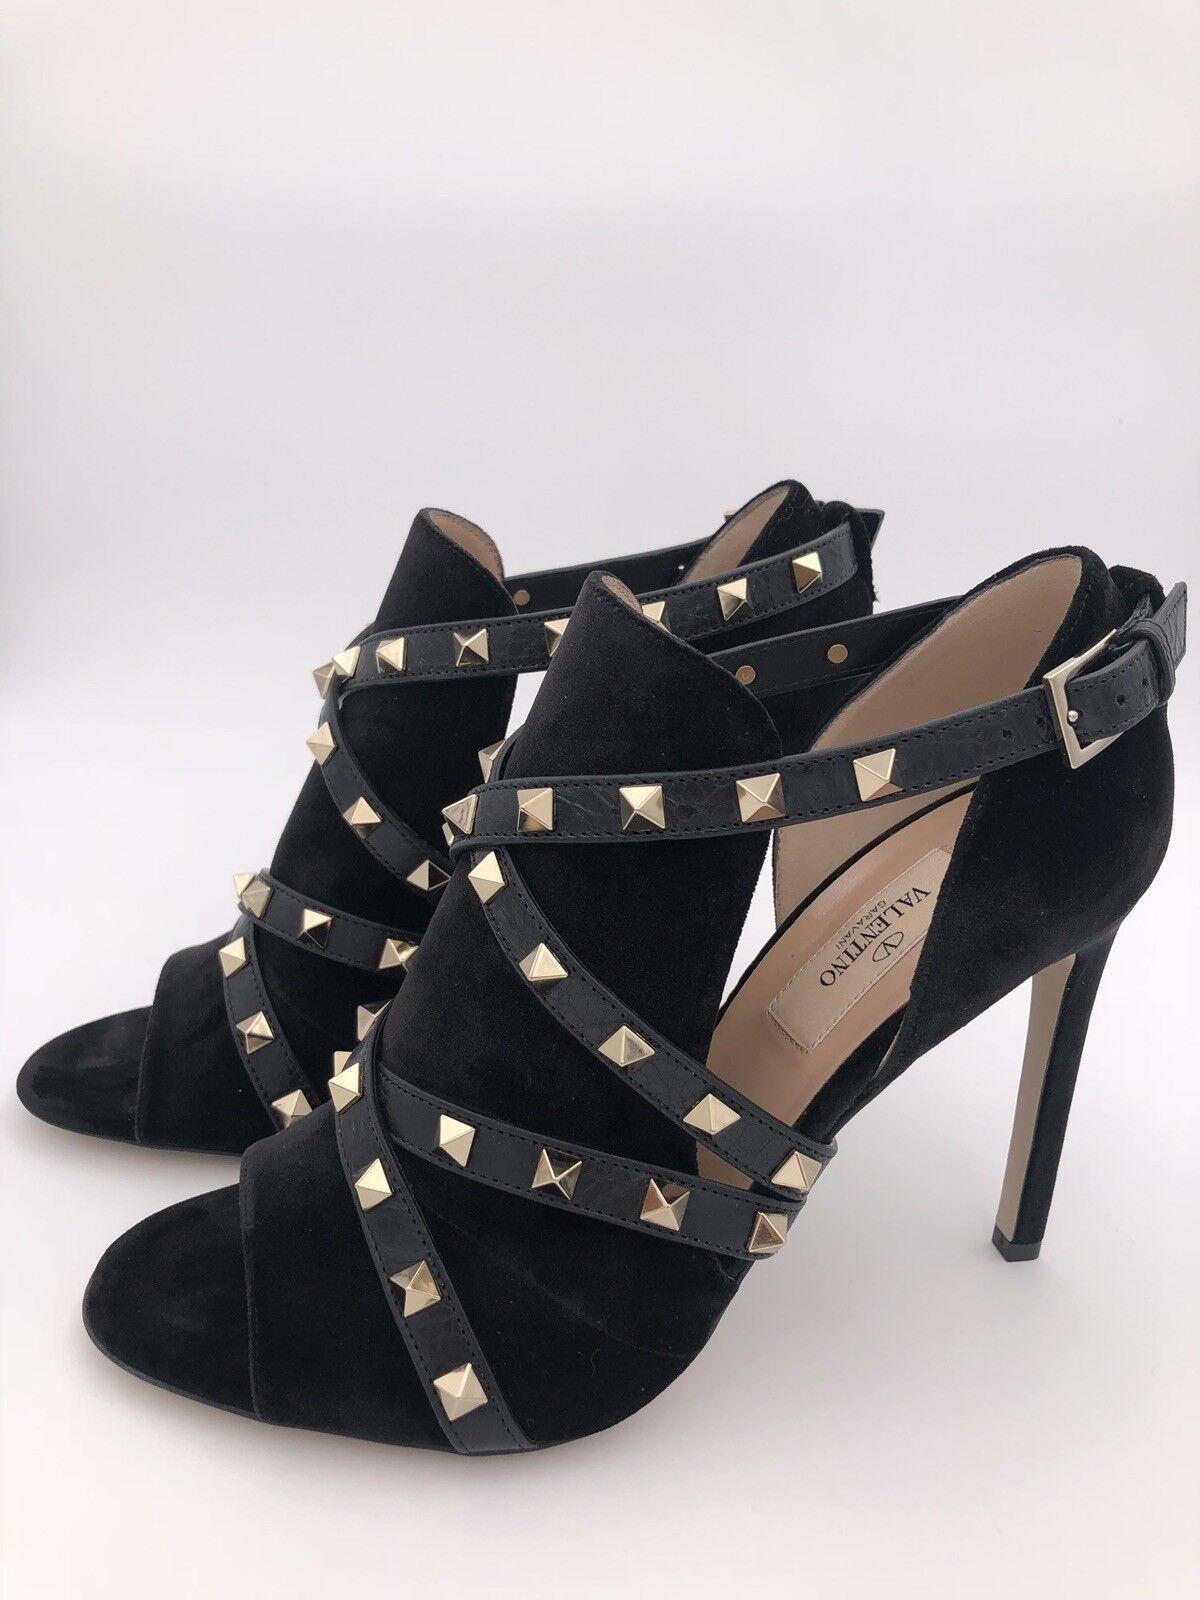 Valentino Garavani Peep Toes schwarz Gr. 38,5 LP  890 EU EU 890 NEU c5abcd